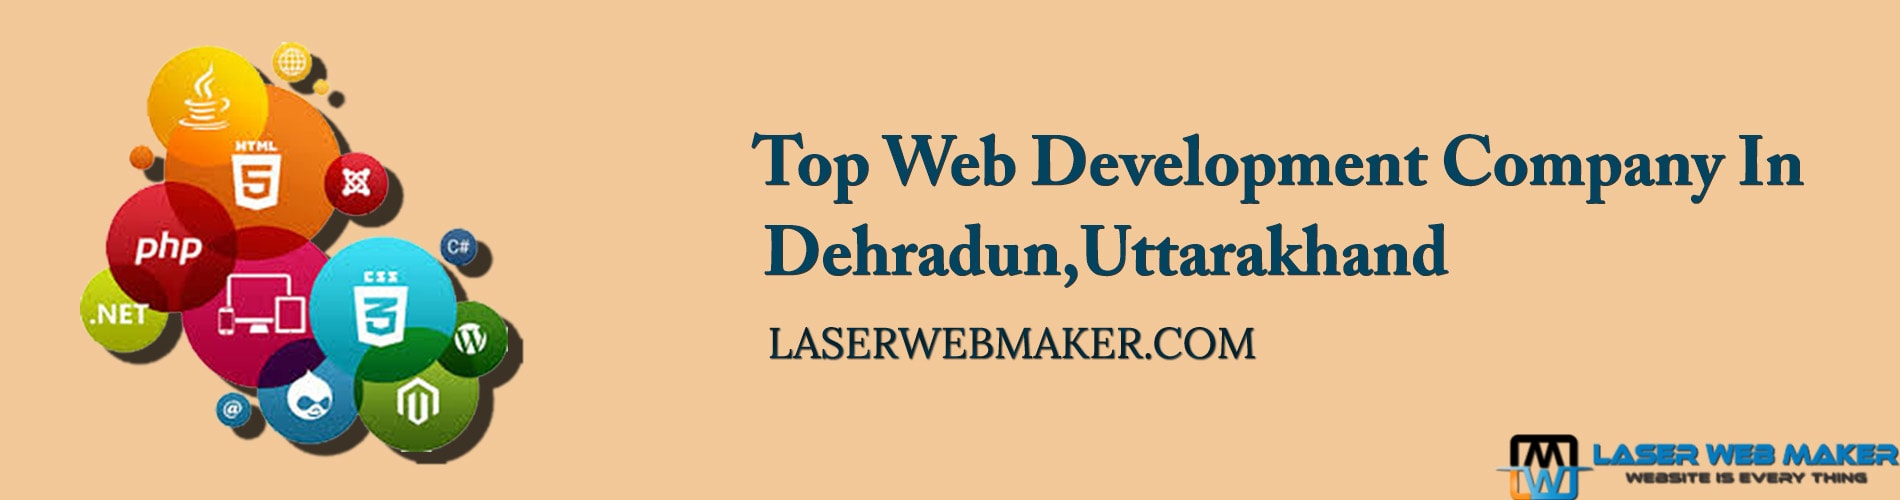 Top Web Development Company In Dehradun, Uttarakhand